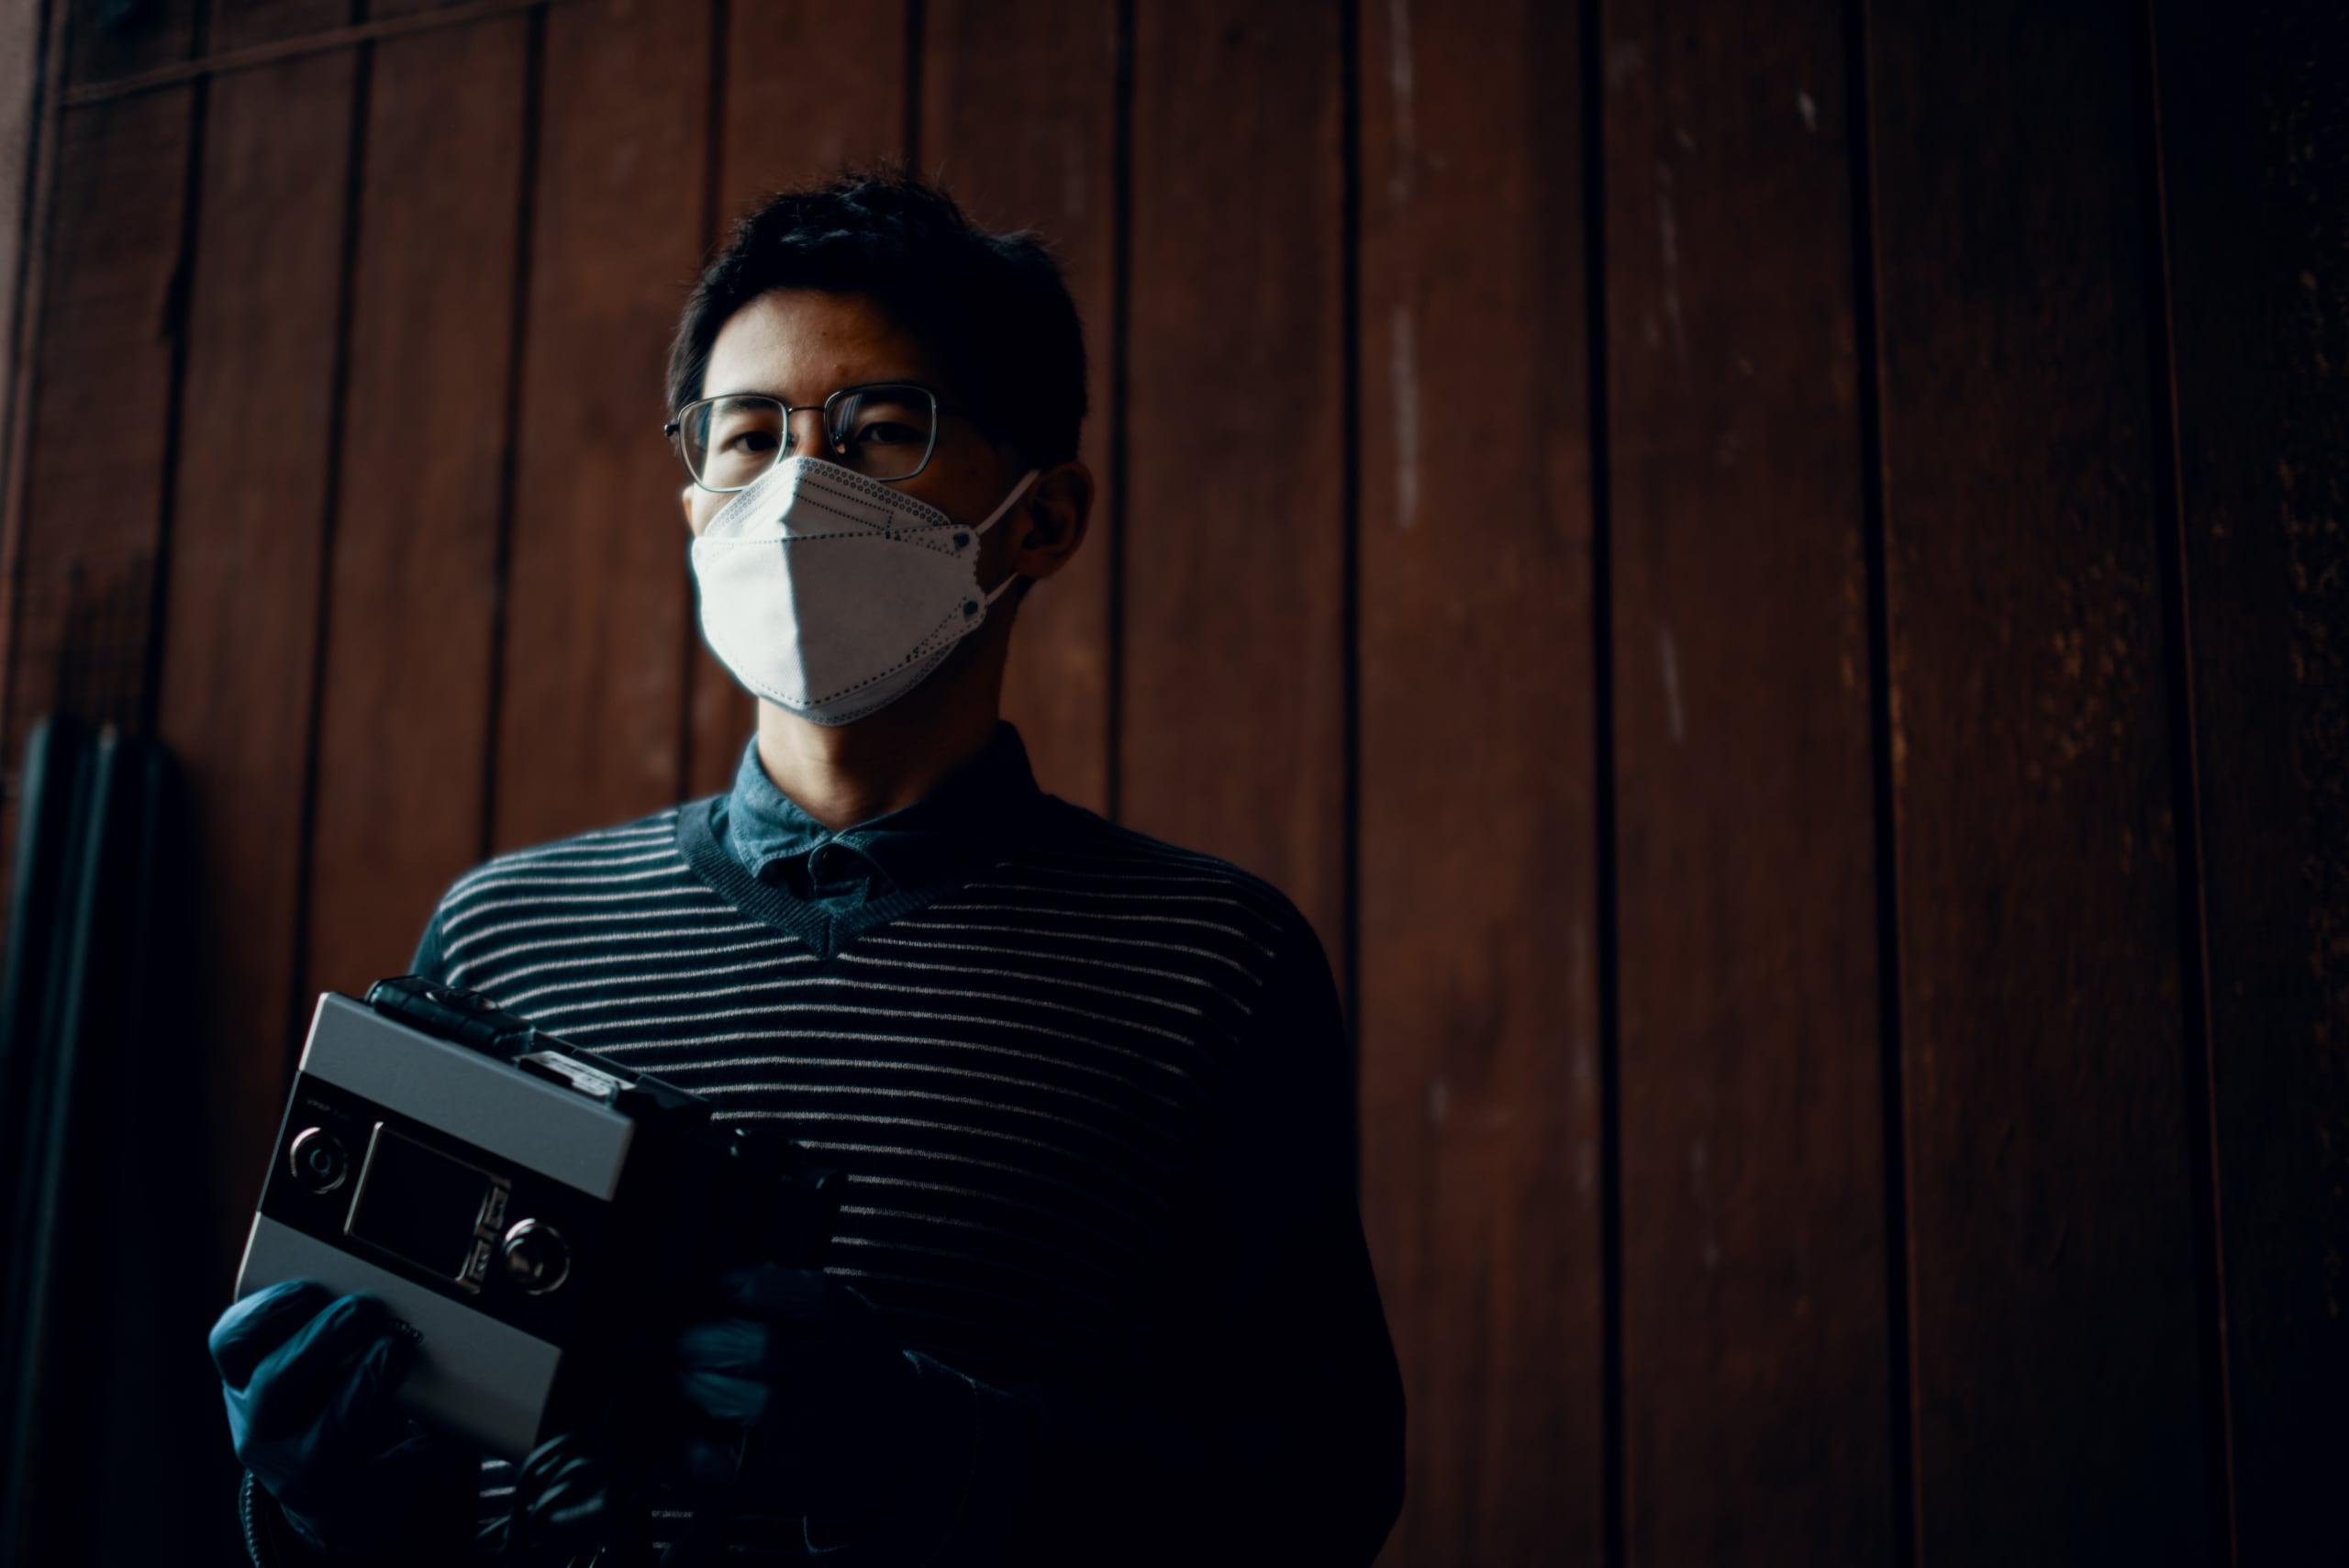 Professor Tao Wei holds a CPAP machine